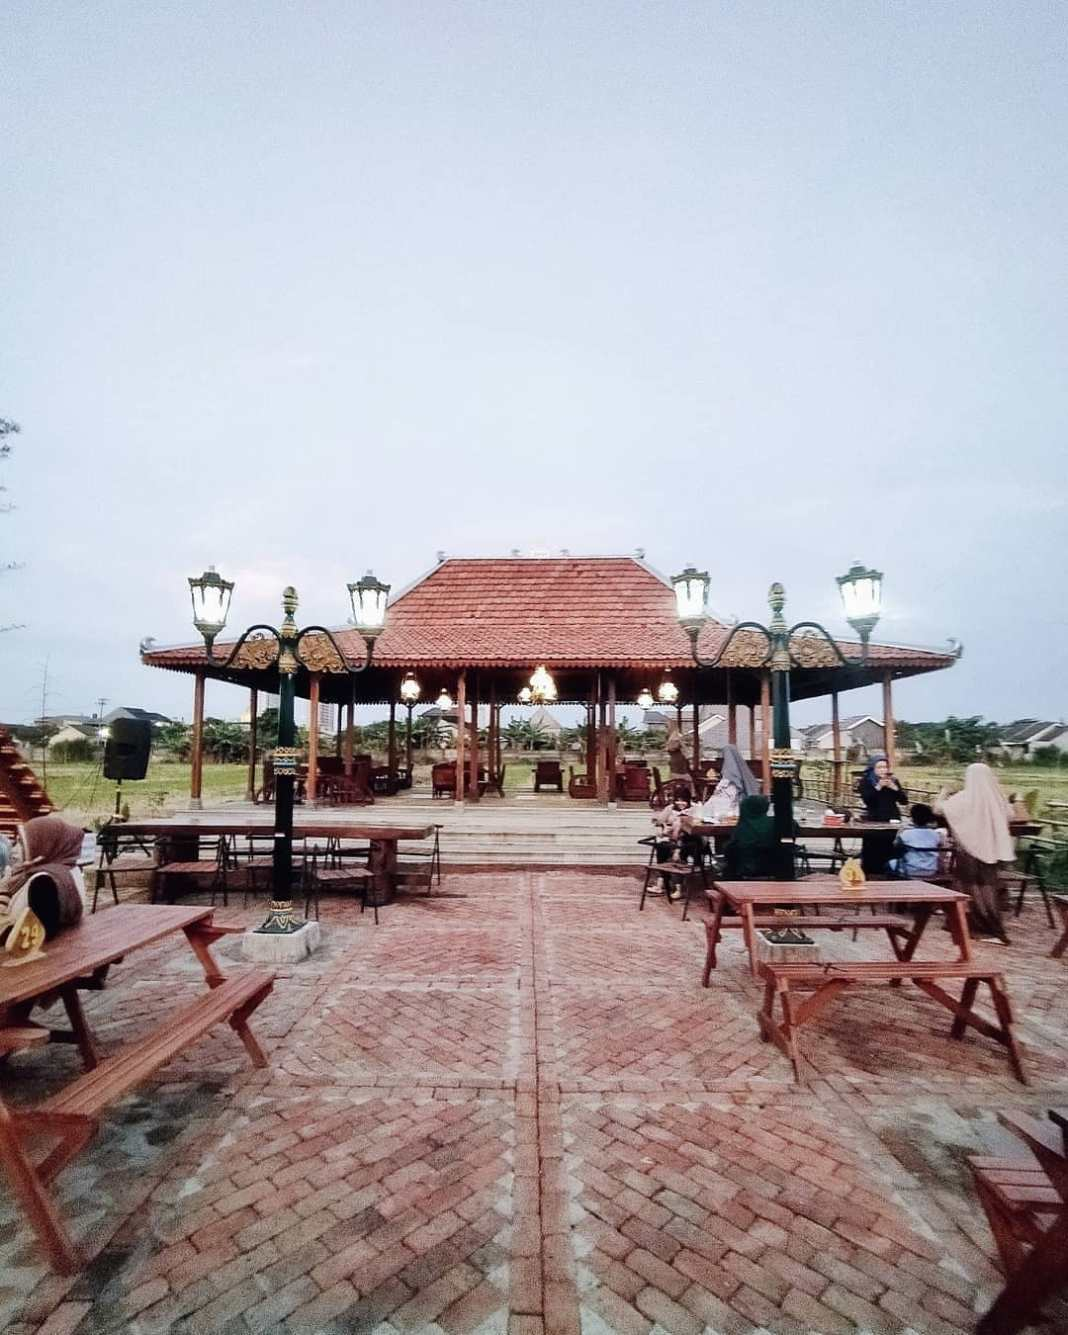 photo today by @jepretanaan taken at Sumput Cafe Wedangan Joglo